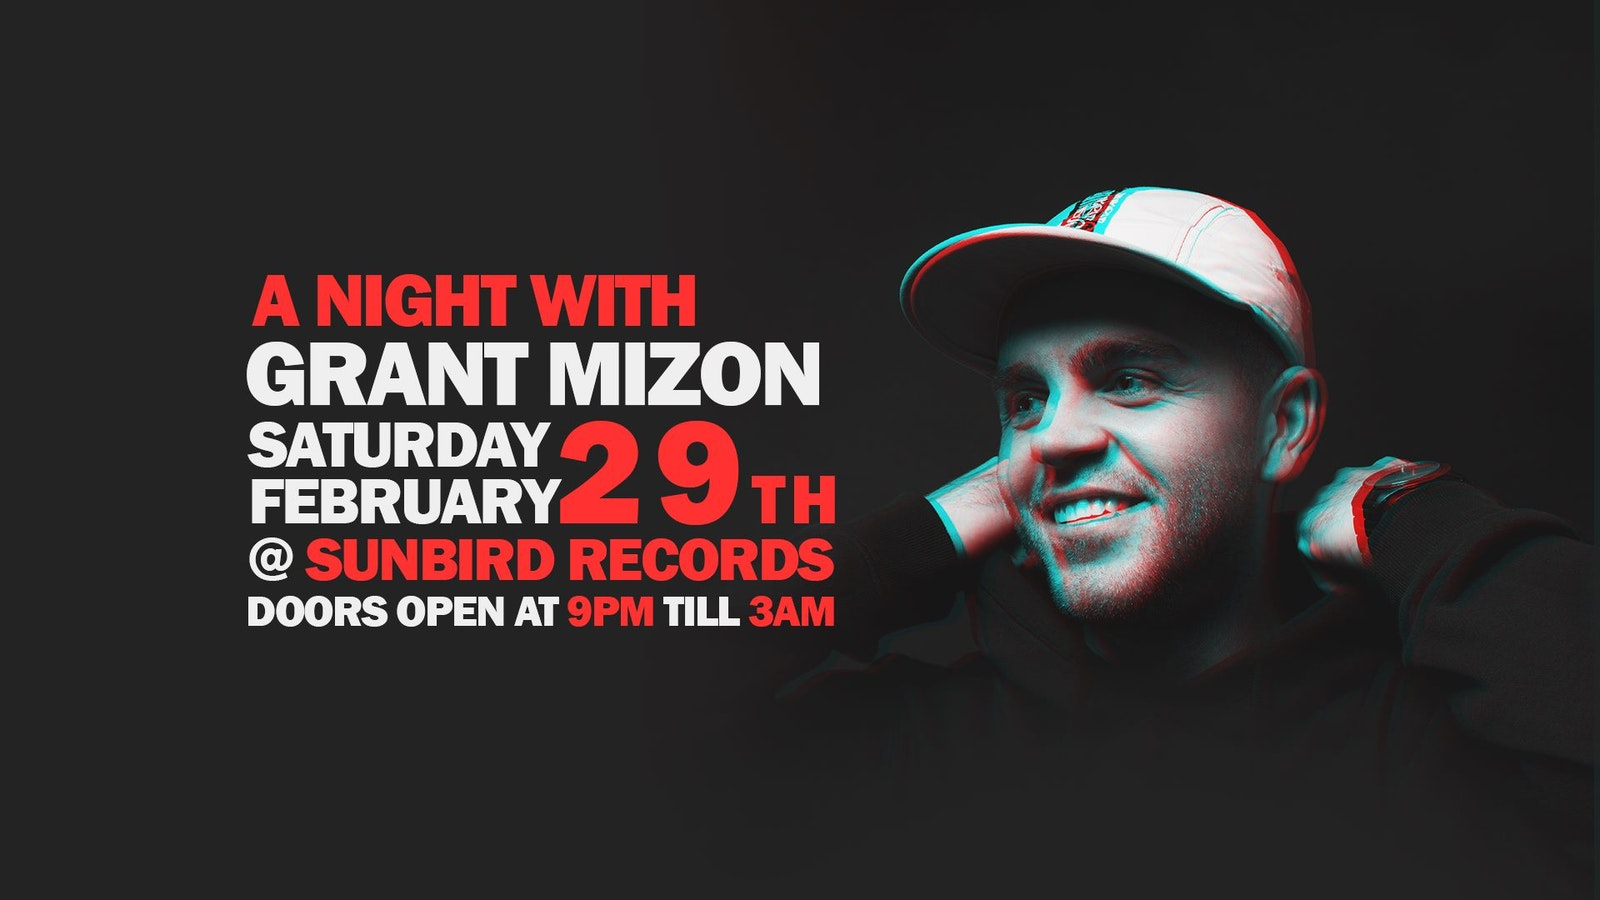 A Night With Grant Mizon